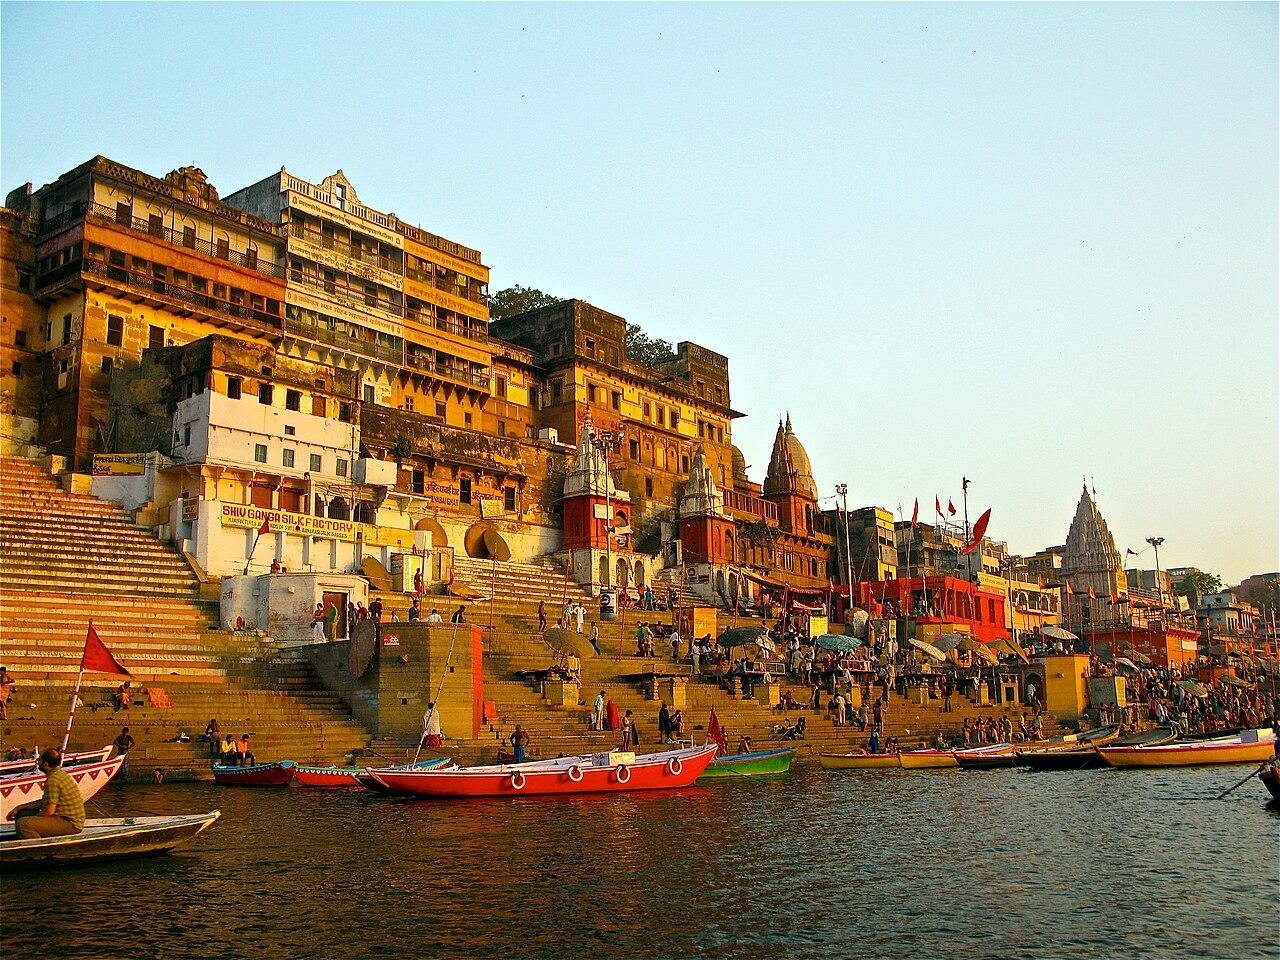 File:Ahilya Ghat by the Ganges, Varanasi.jpg - Wikimedia Commons